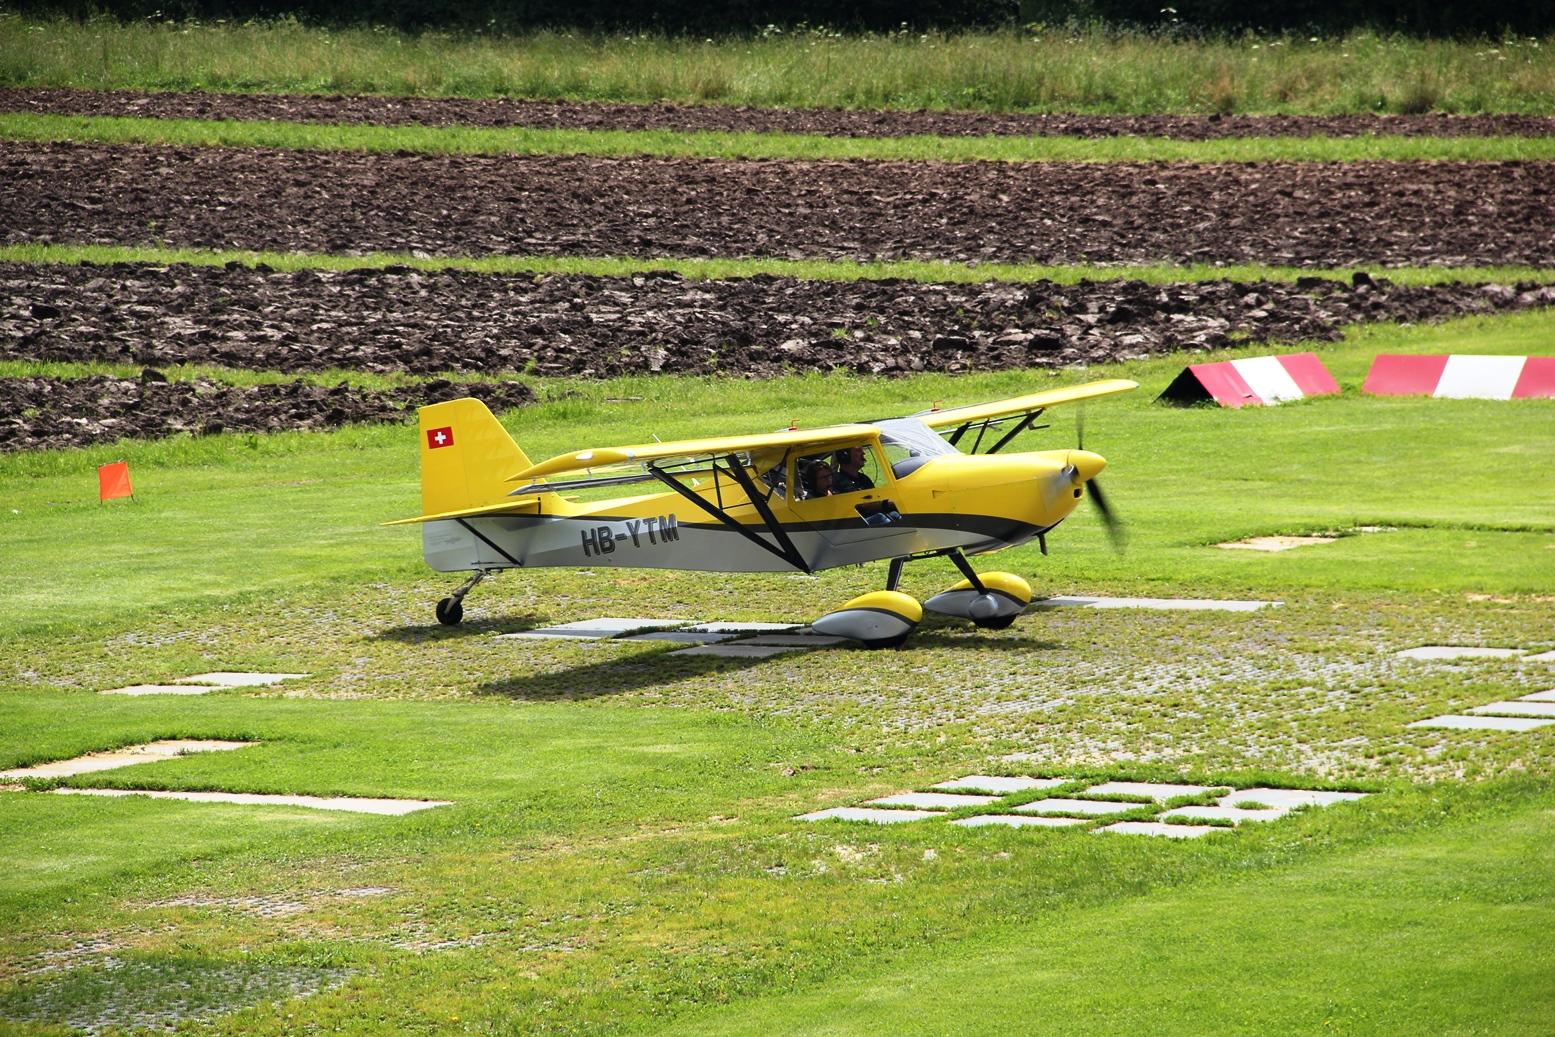 Yellow Fox kurz vor dem Start Piste 30, Foto GJ